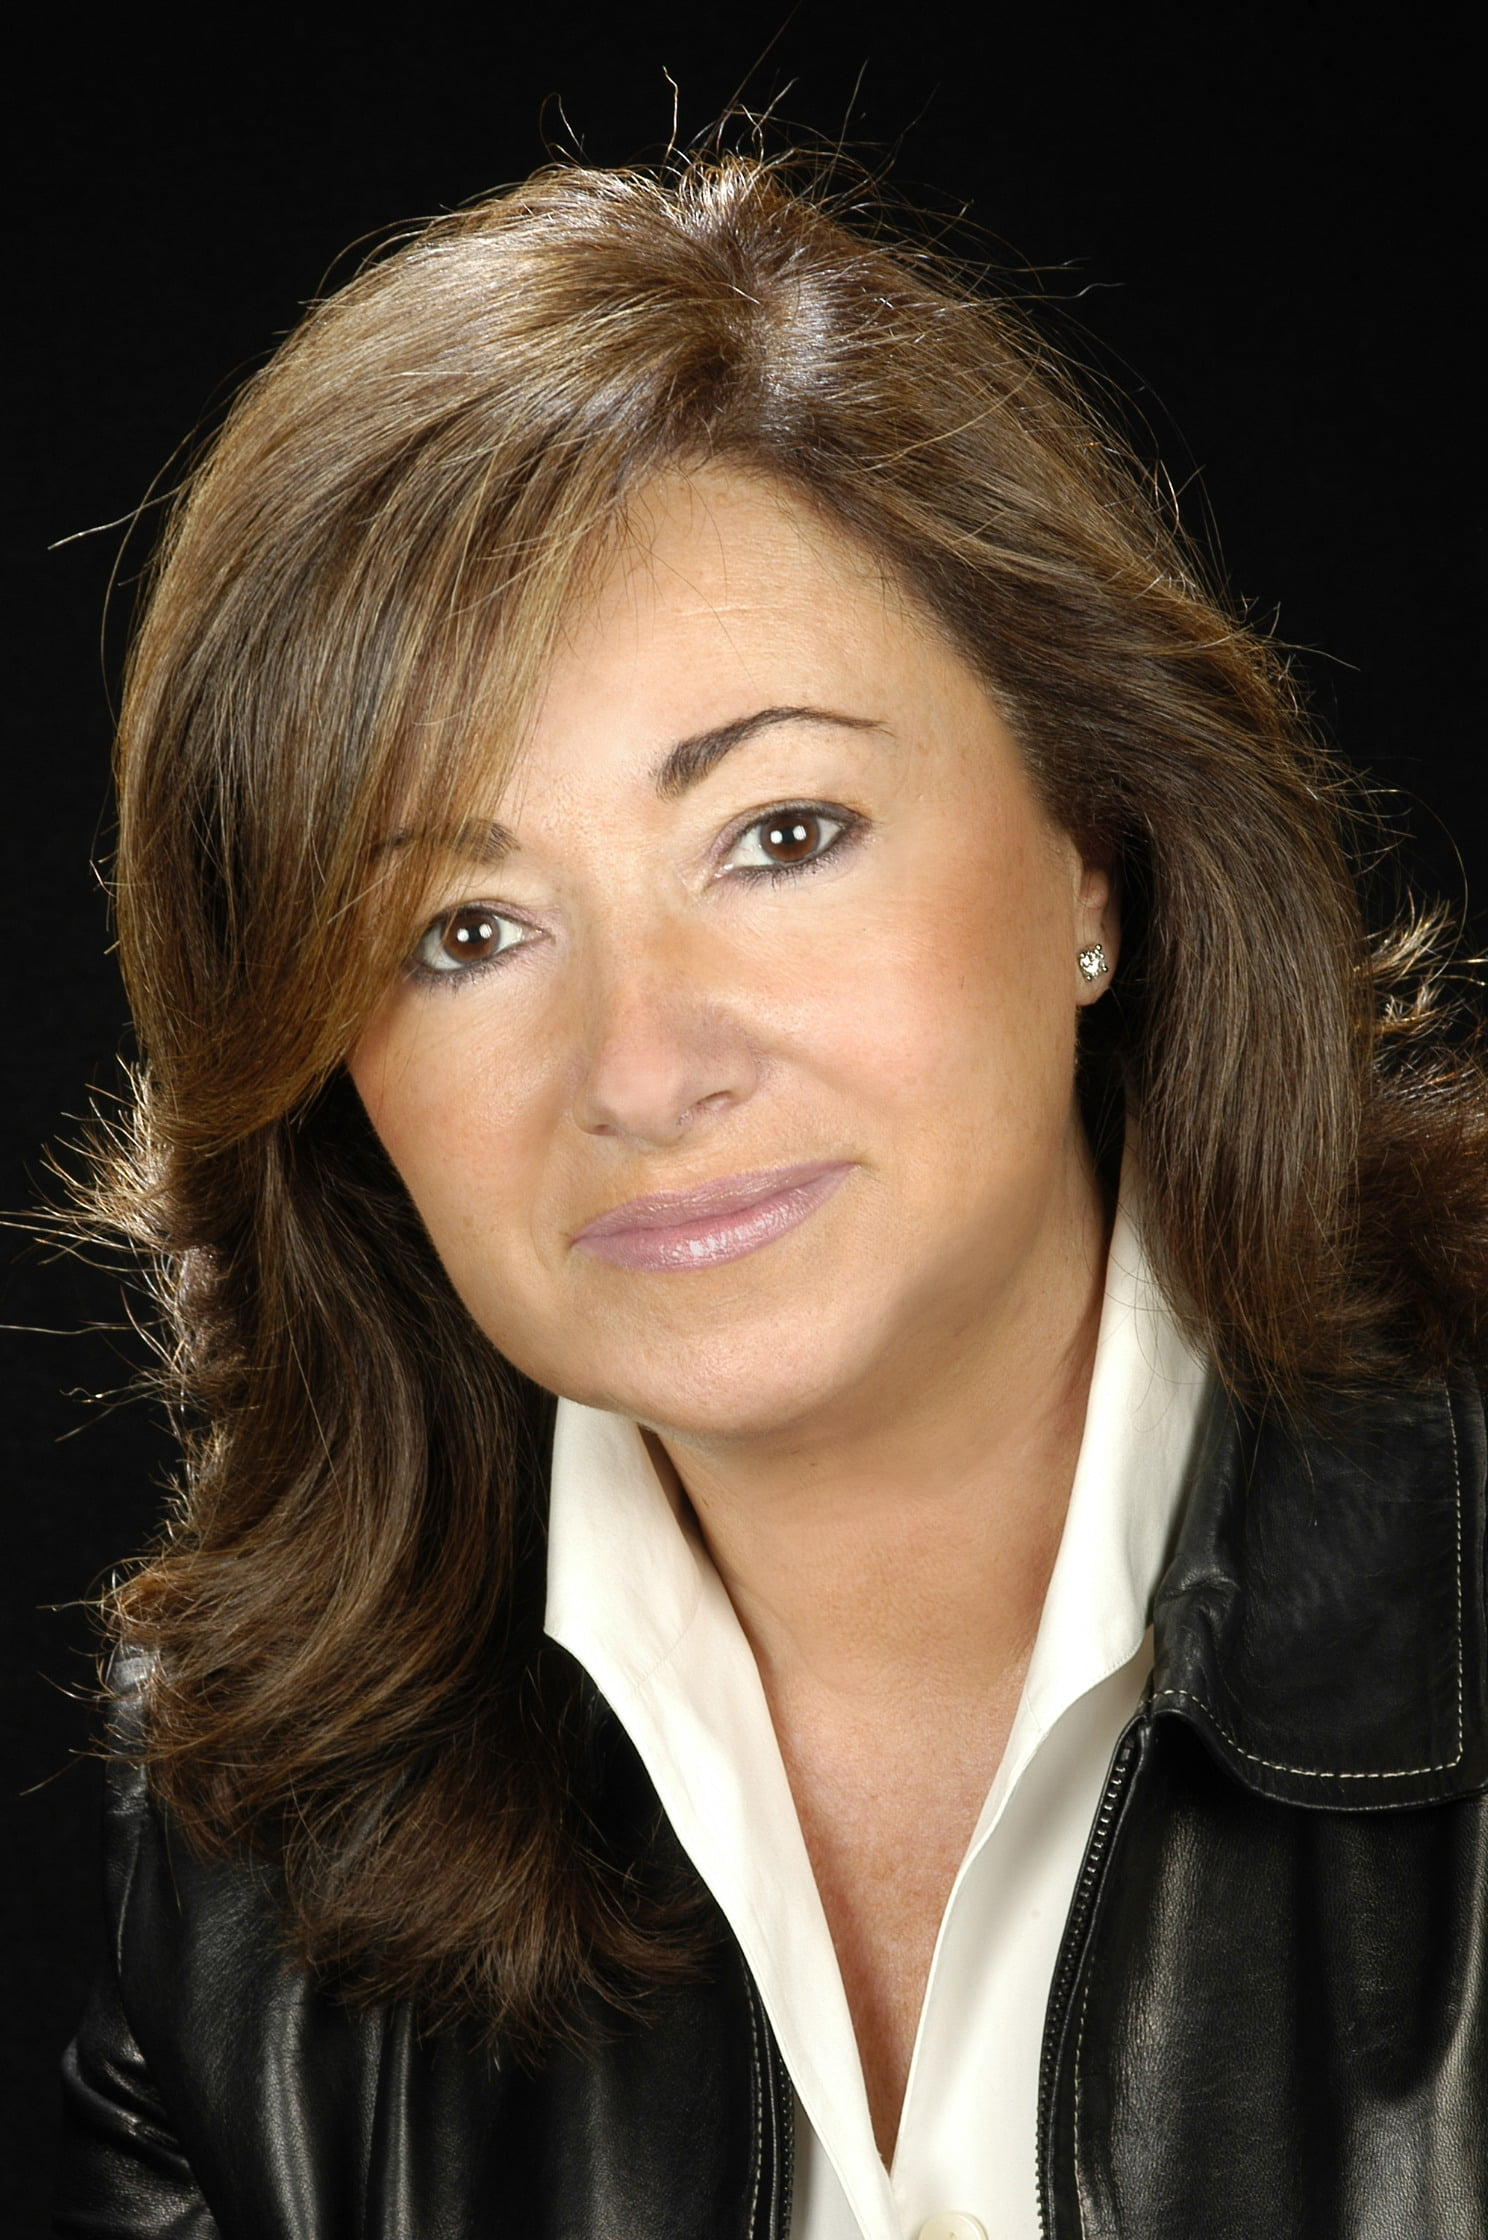 Sra. Montserrat Aymerich Fabregat